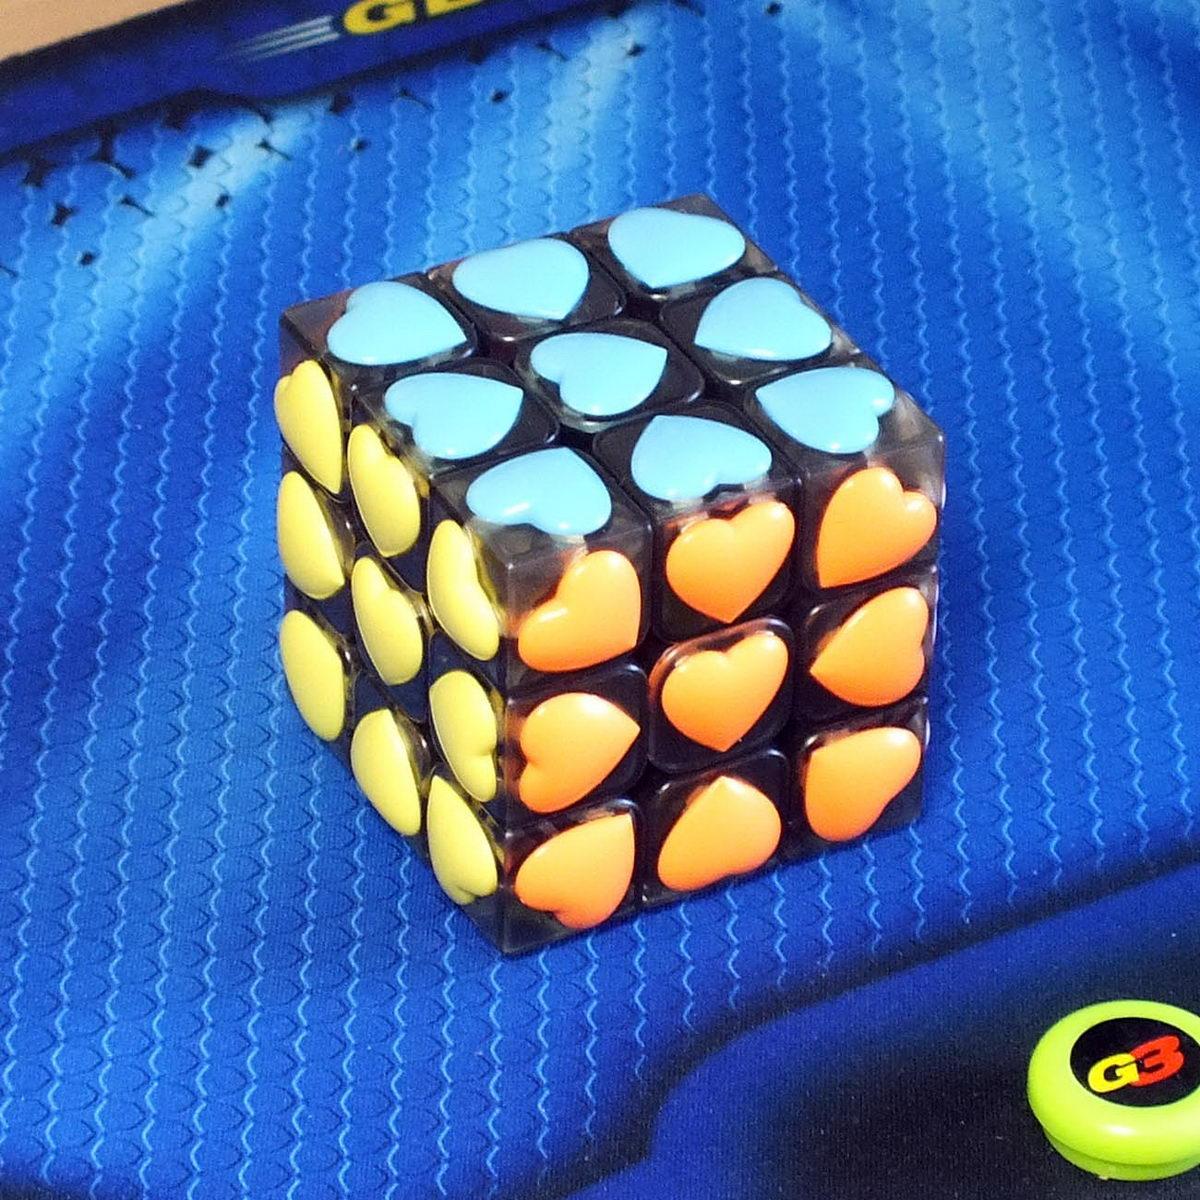 Moyu Love cube 3x3 transparent black